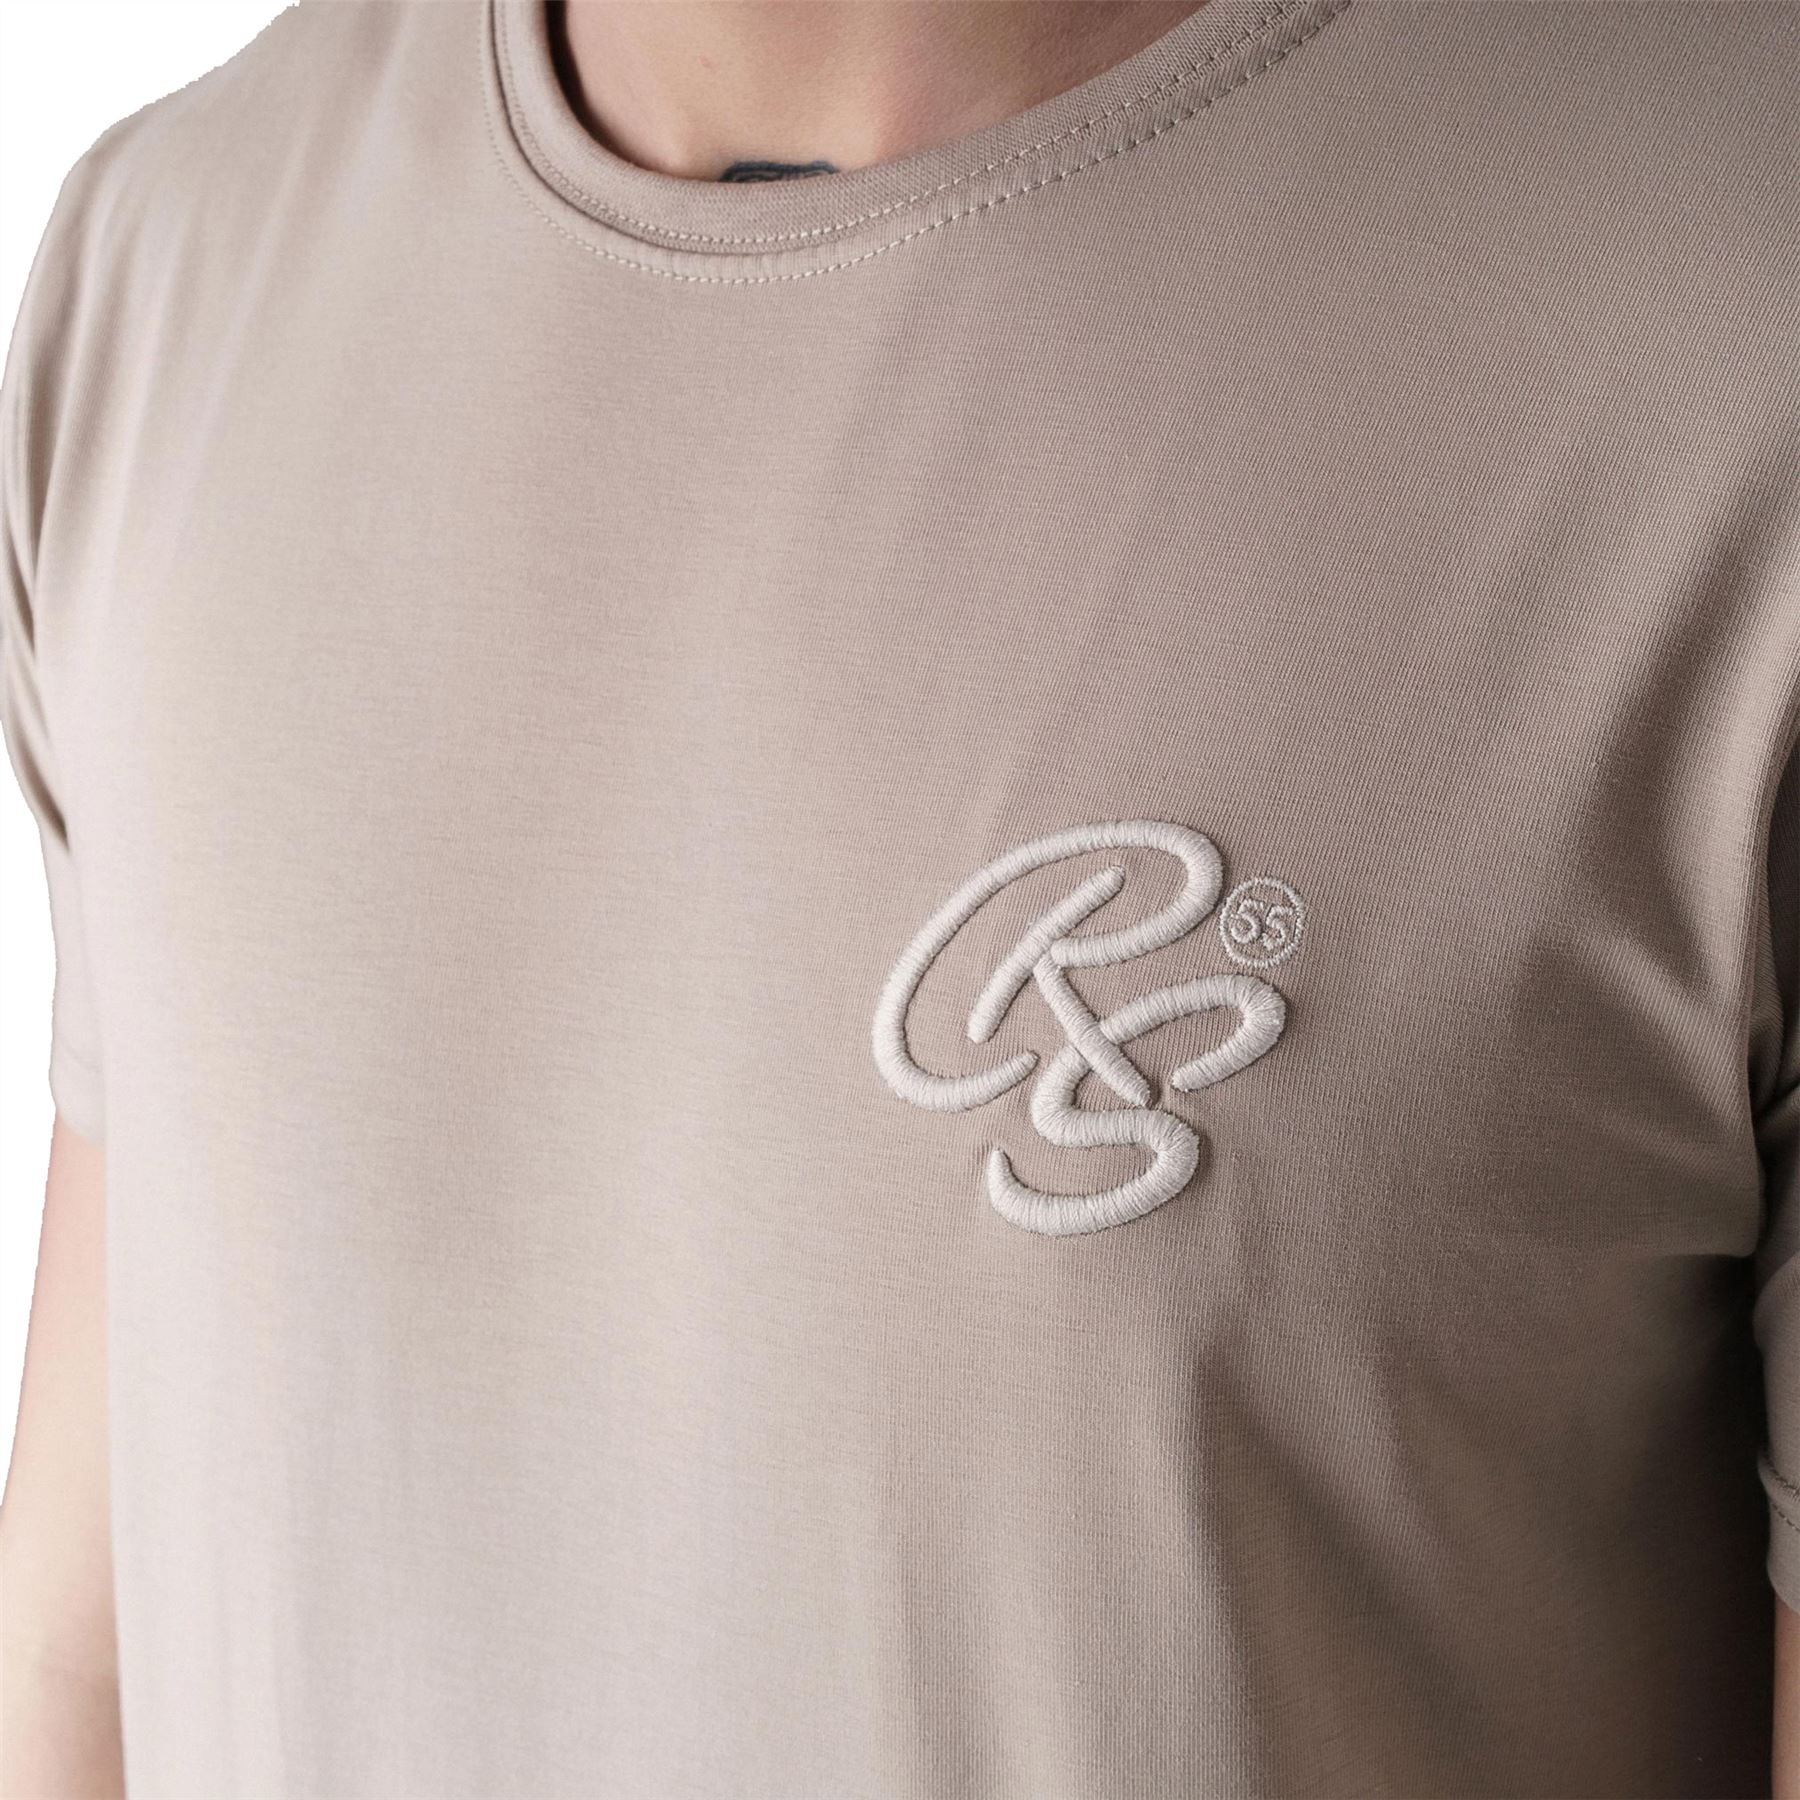 New Mens Crosshatch T-Shirt Embossed Logo Short Sleeved Crew Neck Tee Top